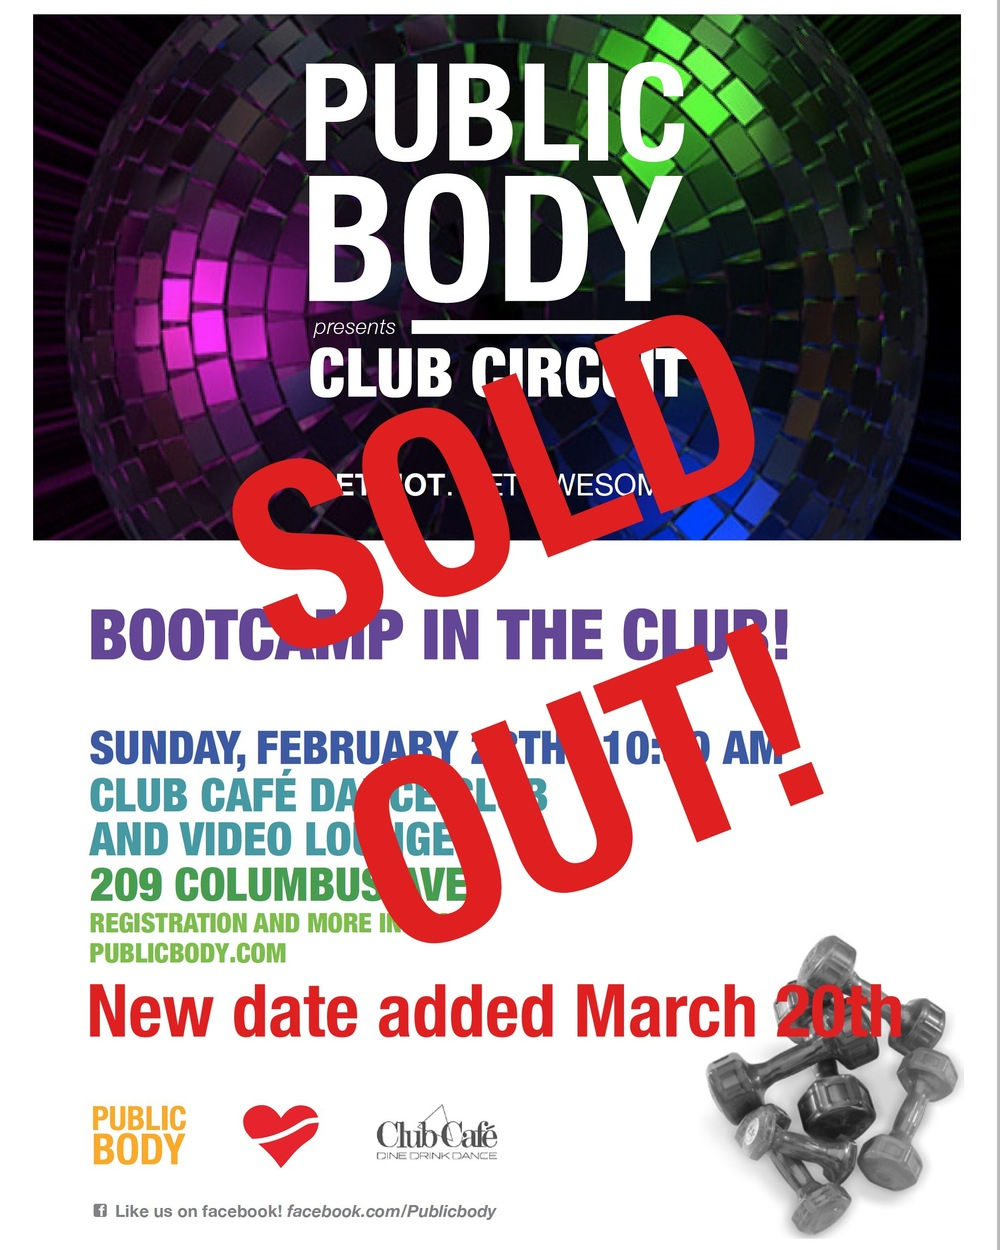 Club_Cafe_Circuit_Training_2016_V1.png